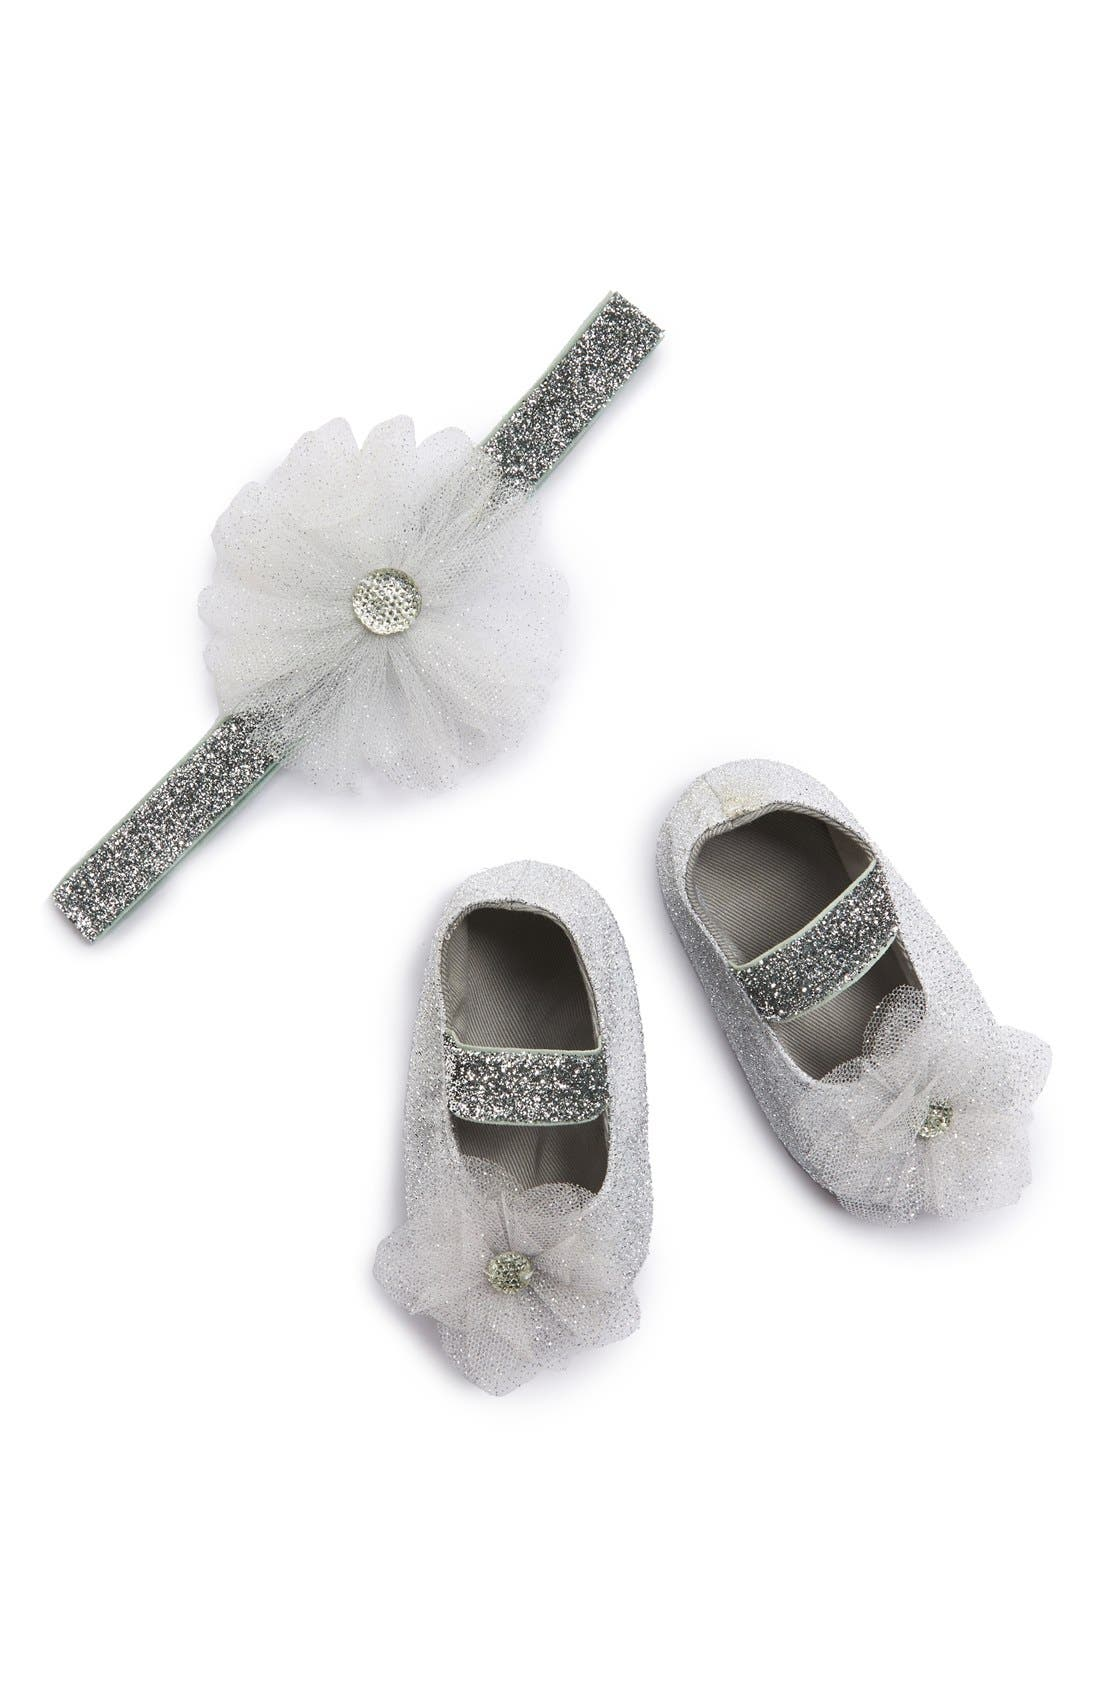 Main Image - PLH Bows & Laces 'Tutu Flower' Glitter Headband & Crib Shoes (Baby Girls)